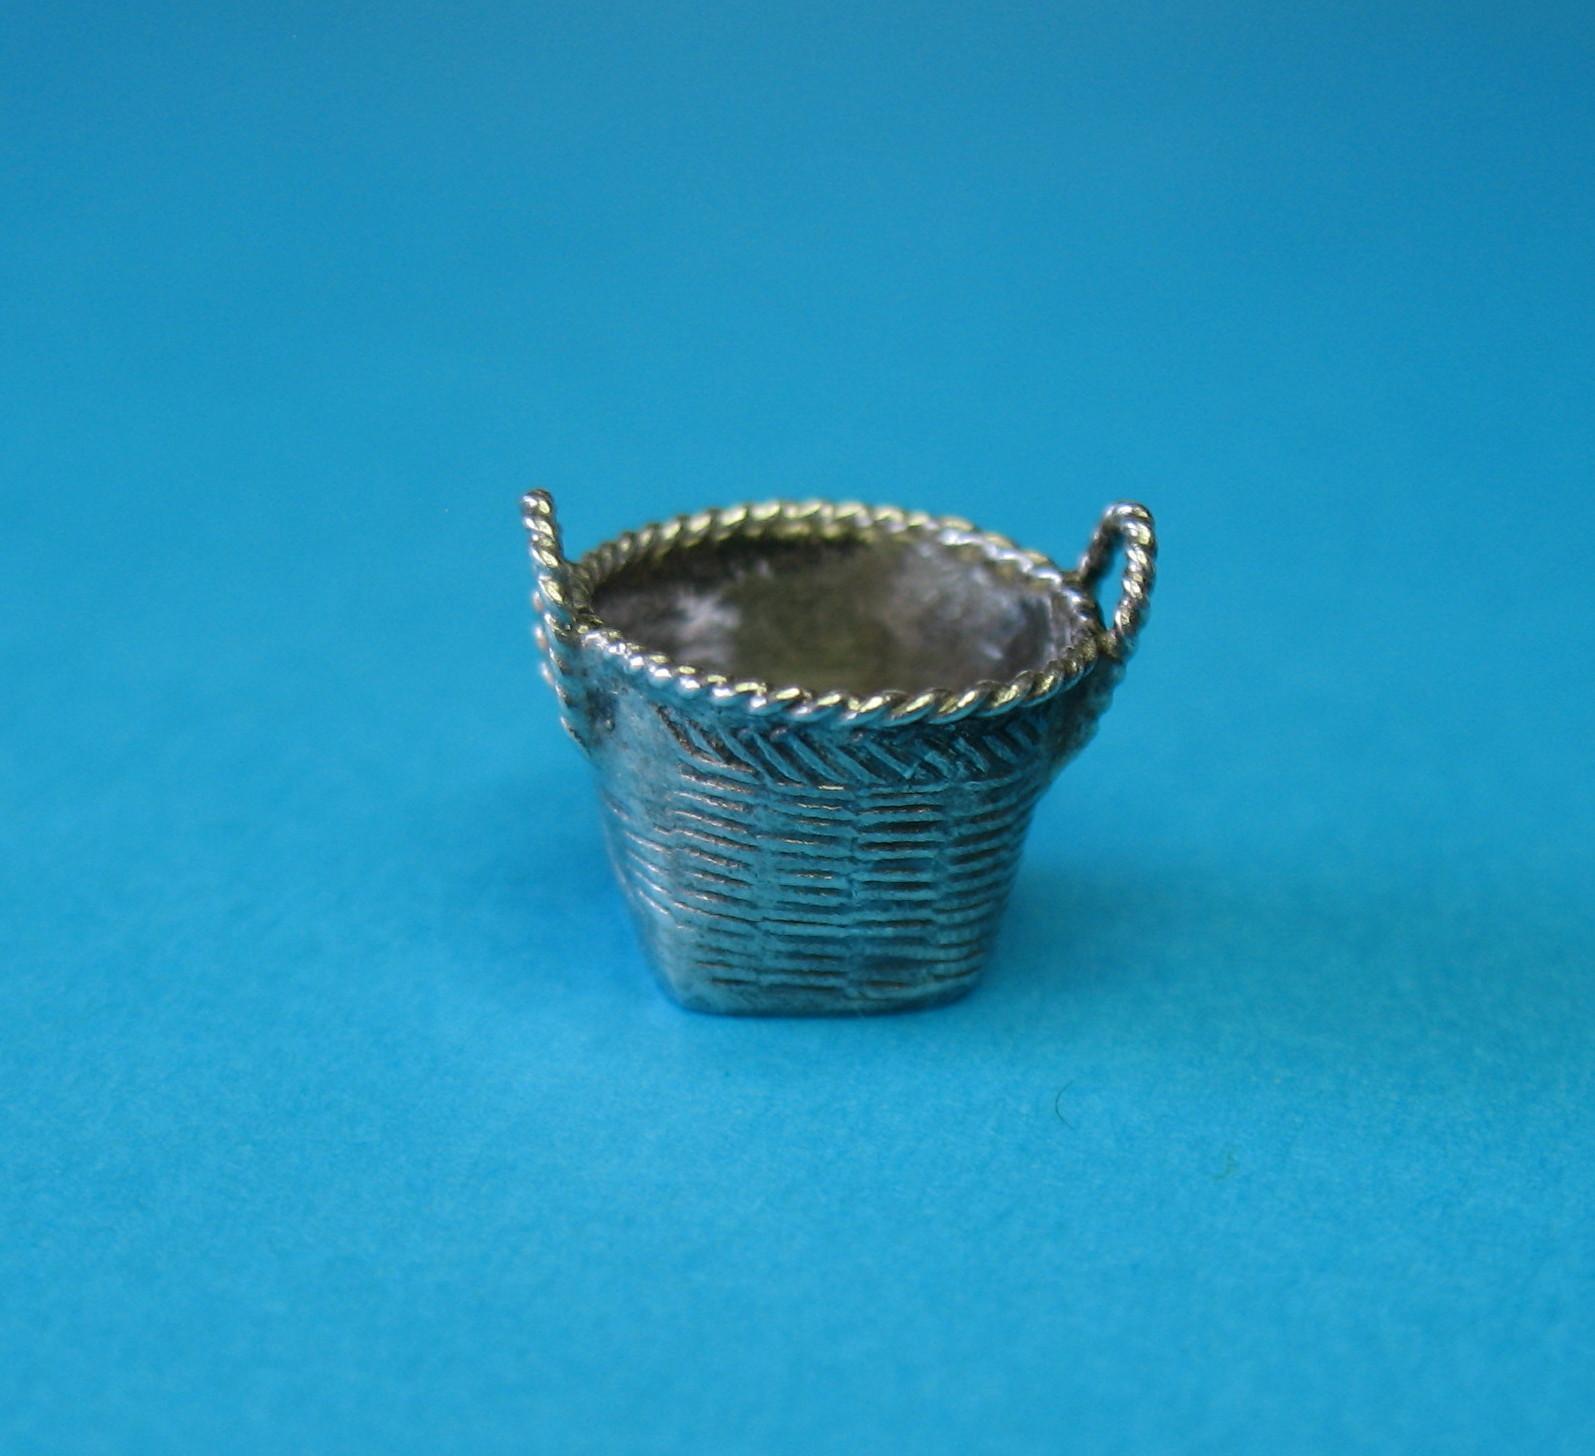 Vintage Silver European Laundry Basket Charm Rare